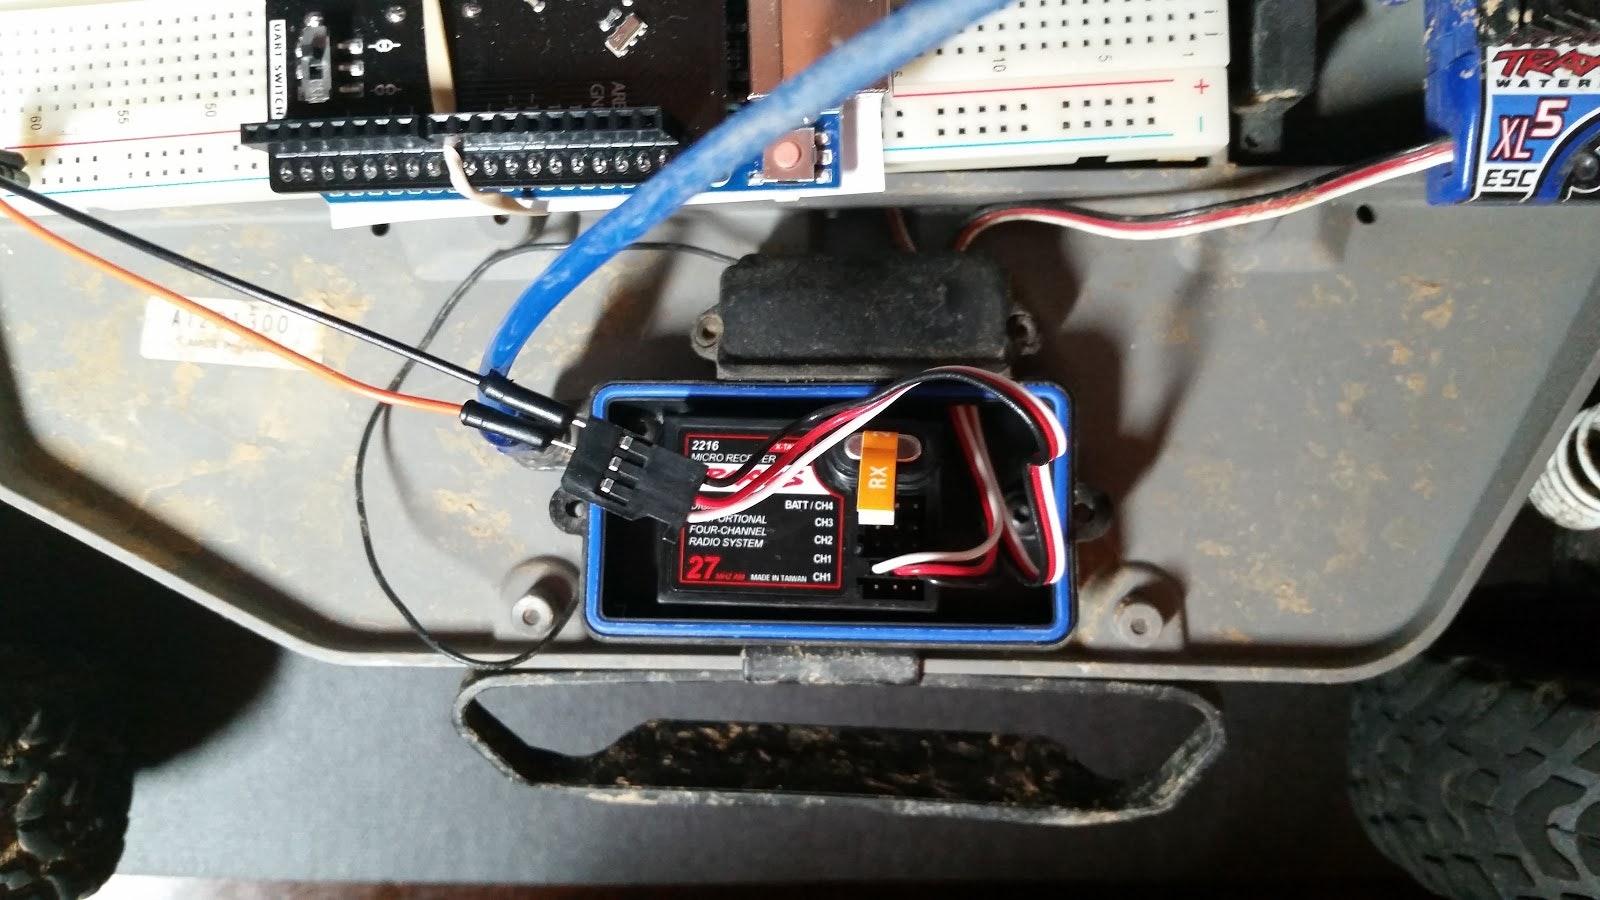 20150816_120758?auto=compress%2Cformat&w=680&h=510&fit=max r c traxxas slash with arduino and 1sheeld hackster io traxxas xl5 esc wiring diagram at honlapkeszites.co